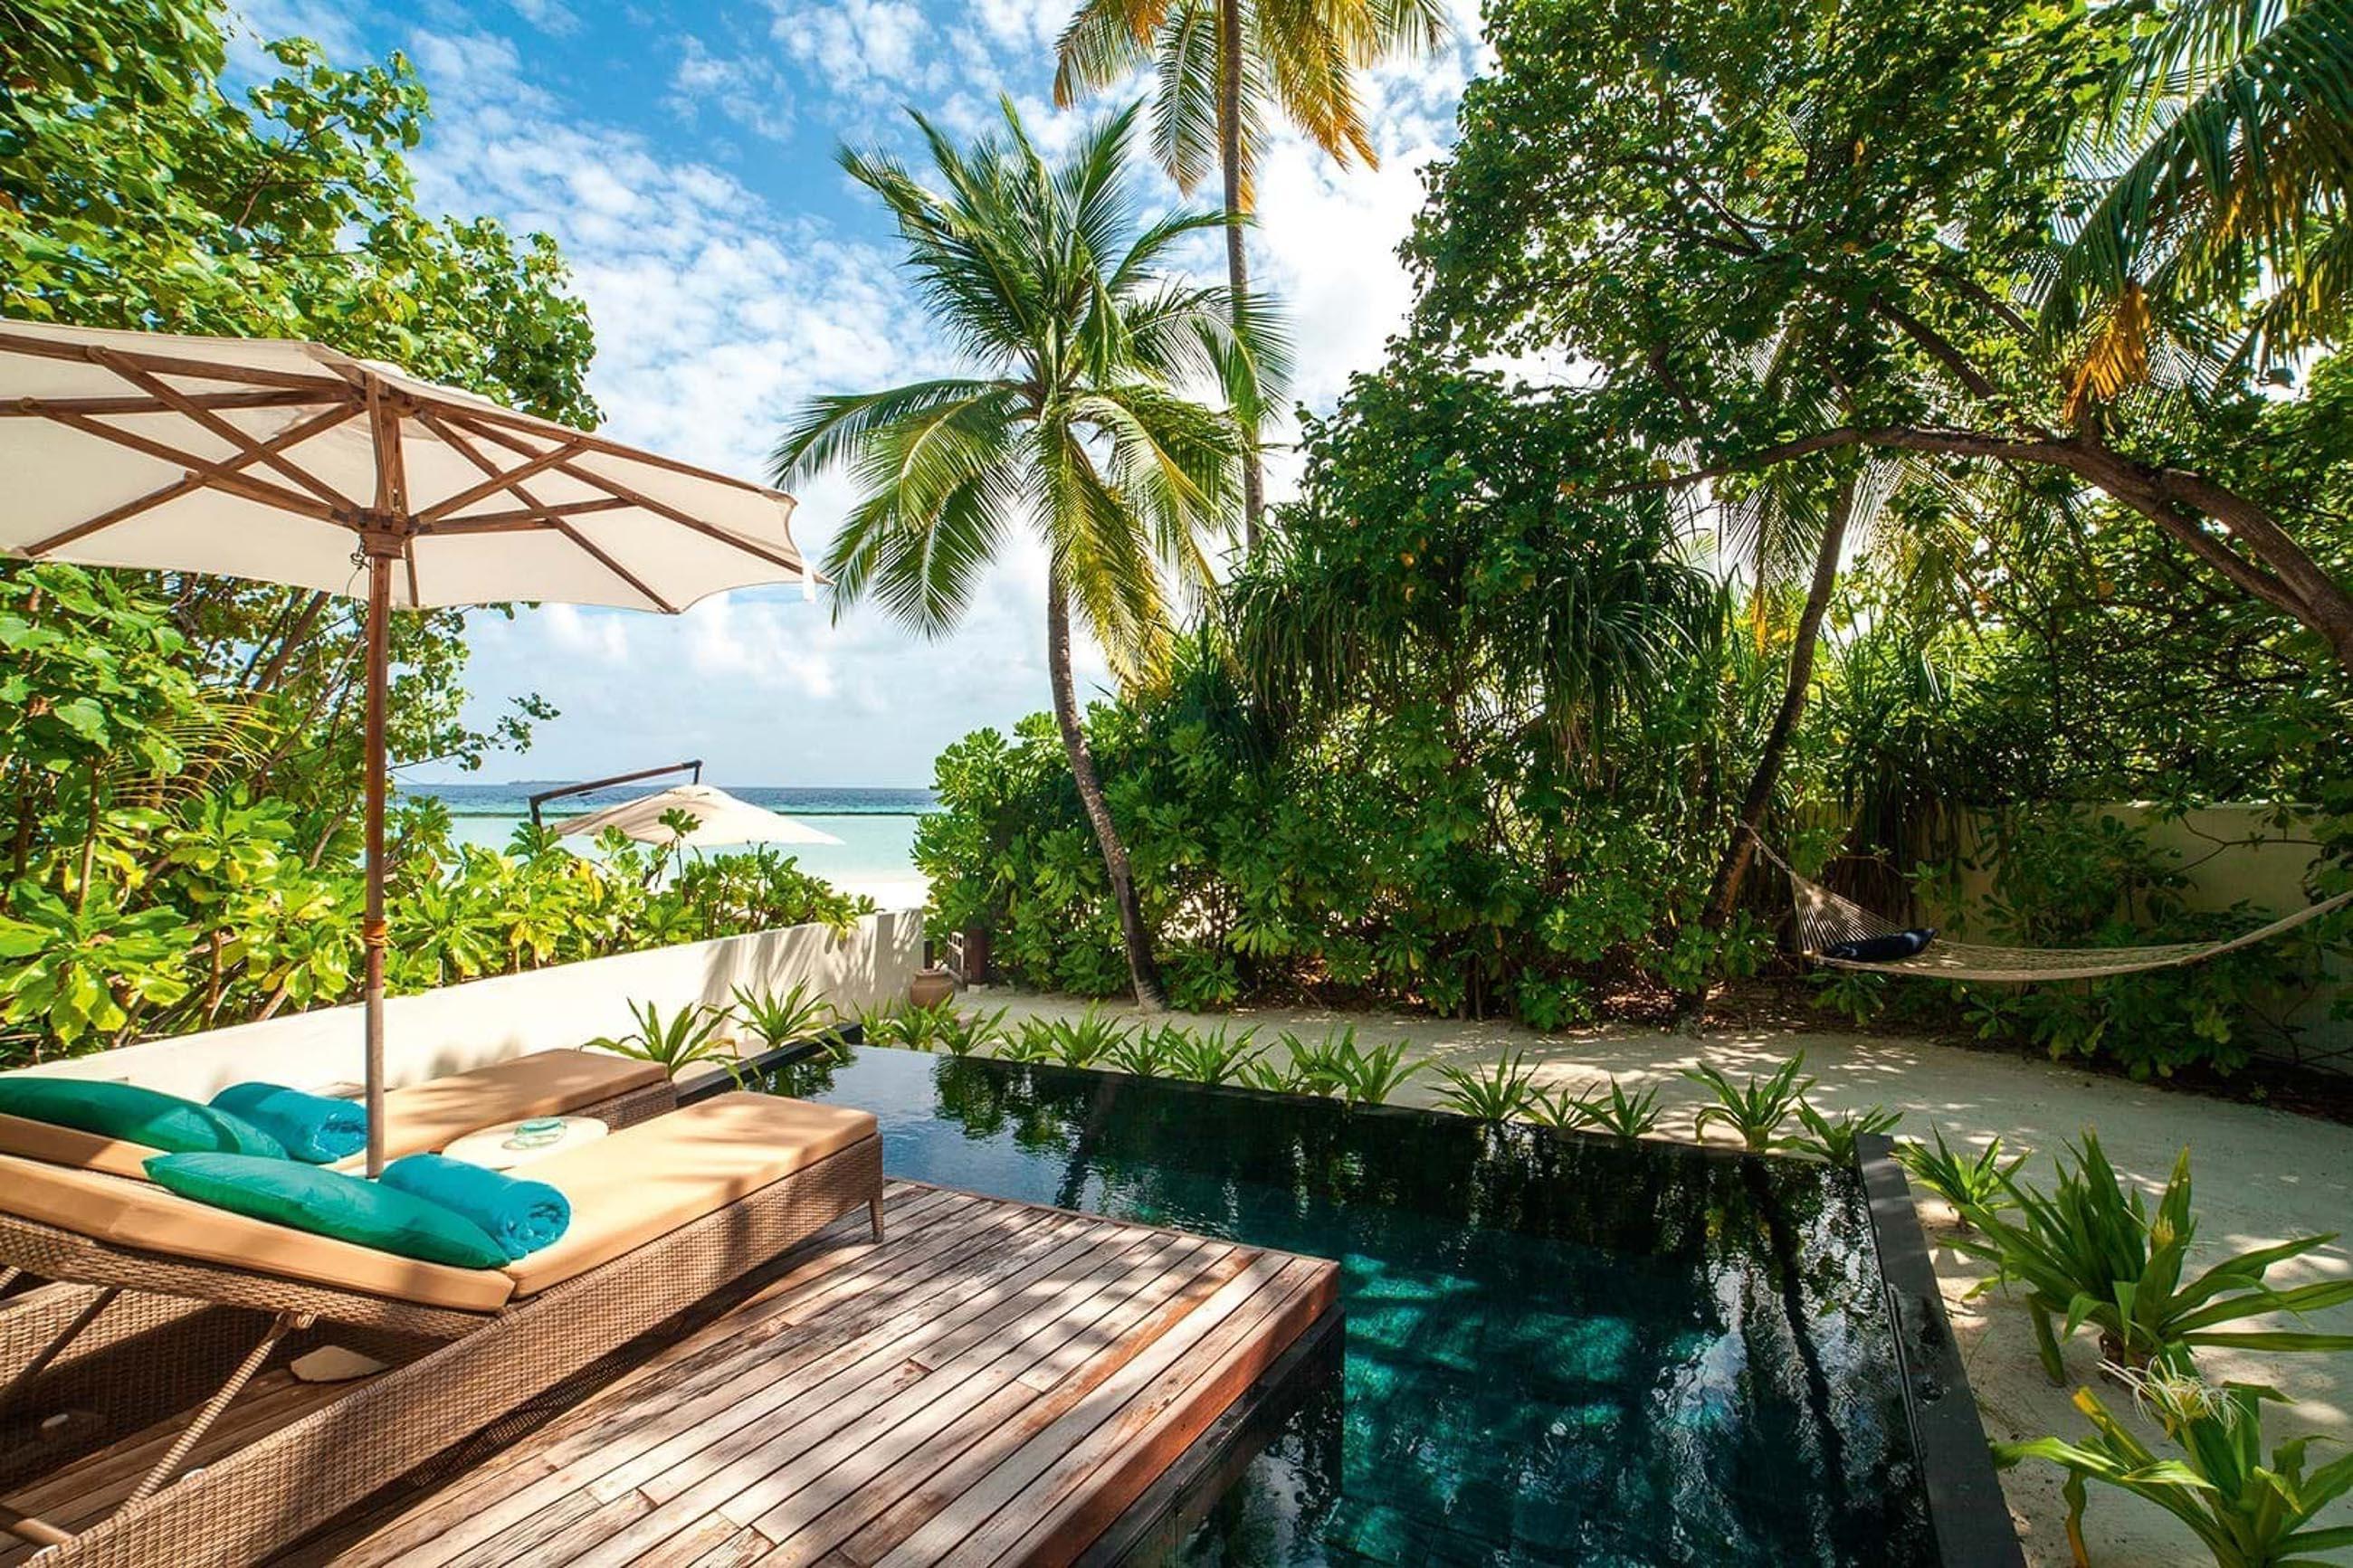 https://bubo.sk/uploads/galleries/16372/halaveli-maldives-2016-beach-villa-01-5.jpg